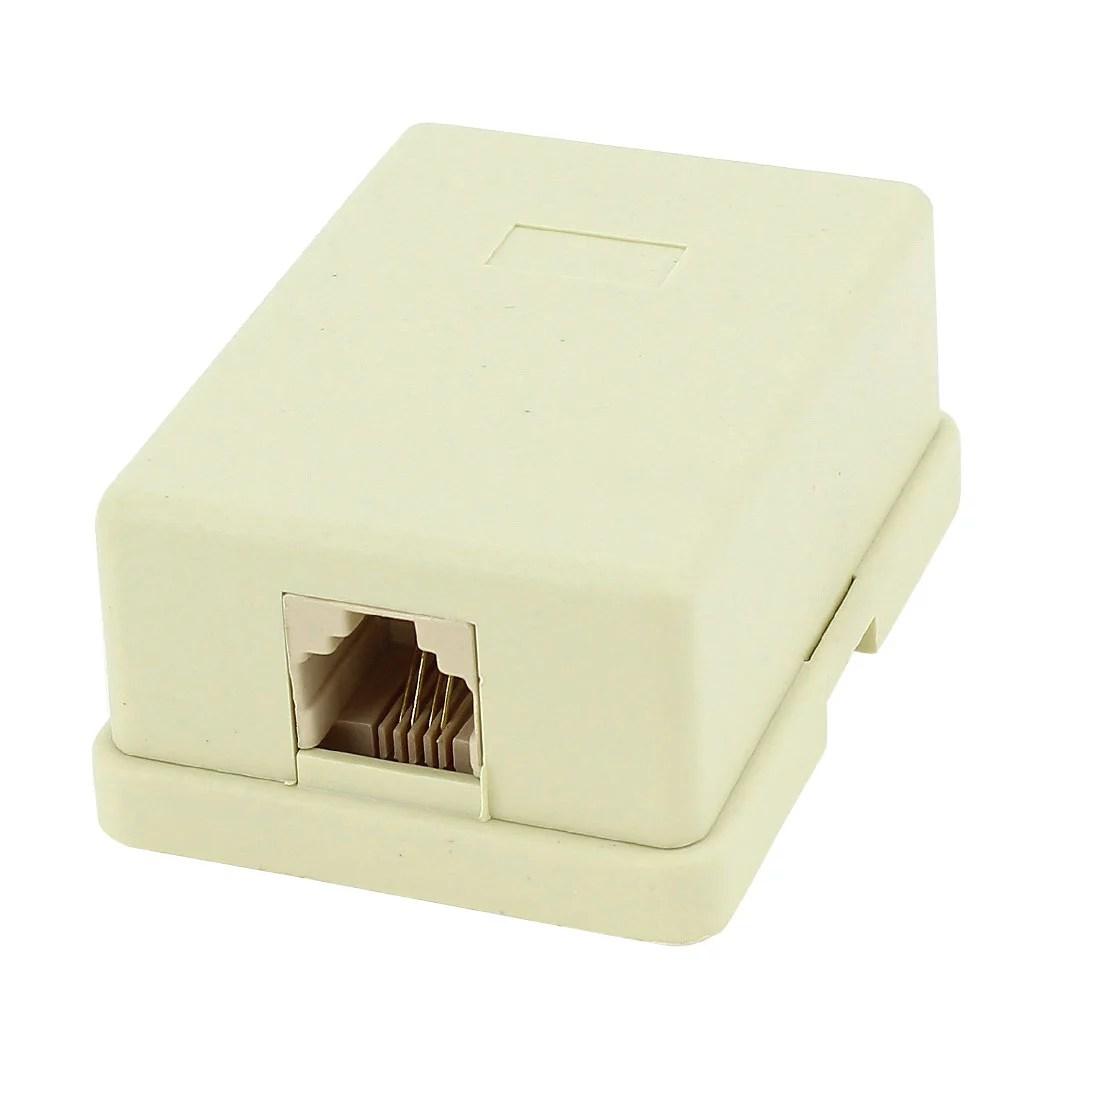 hight resolution of wall mount keystone single port telephone phone jacks 6p4c rj11 walmart com